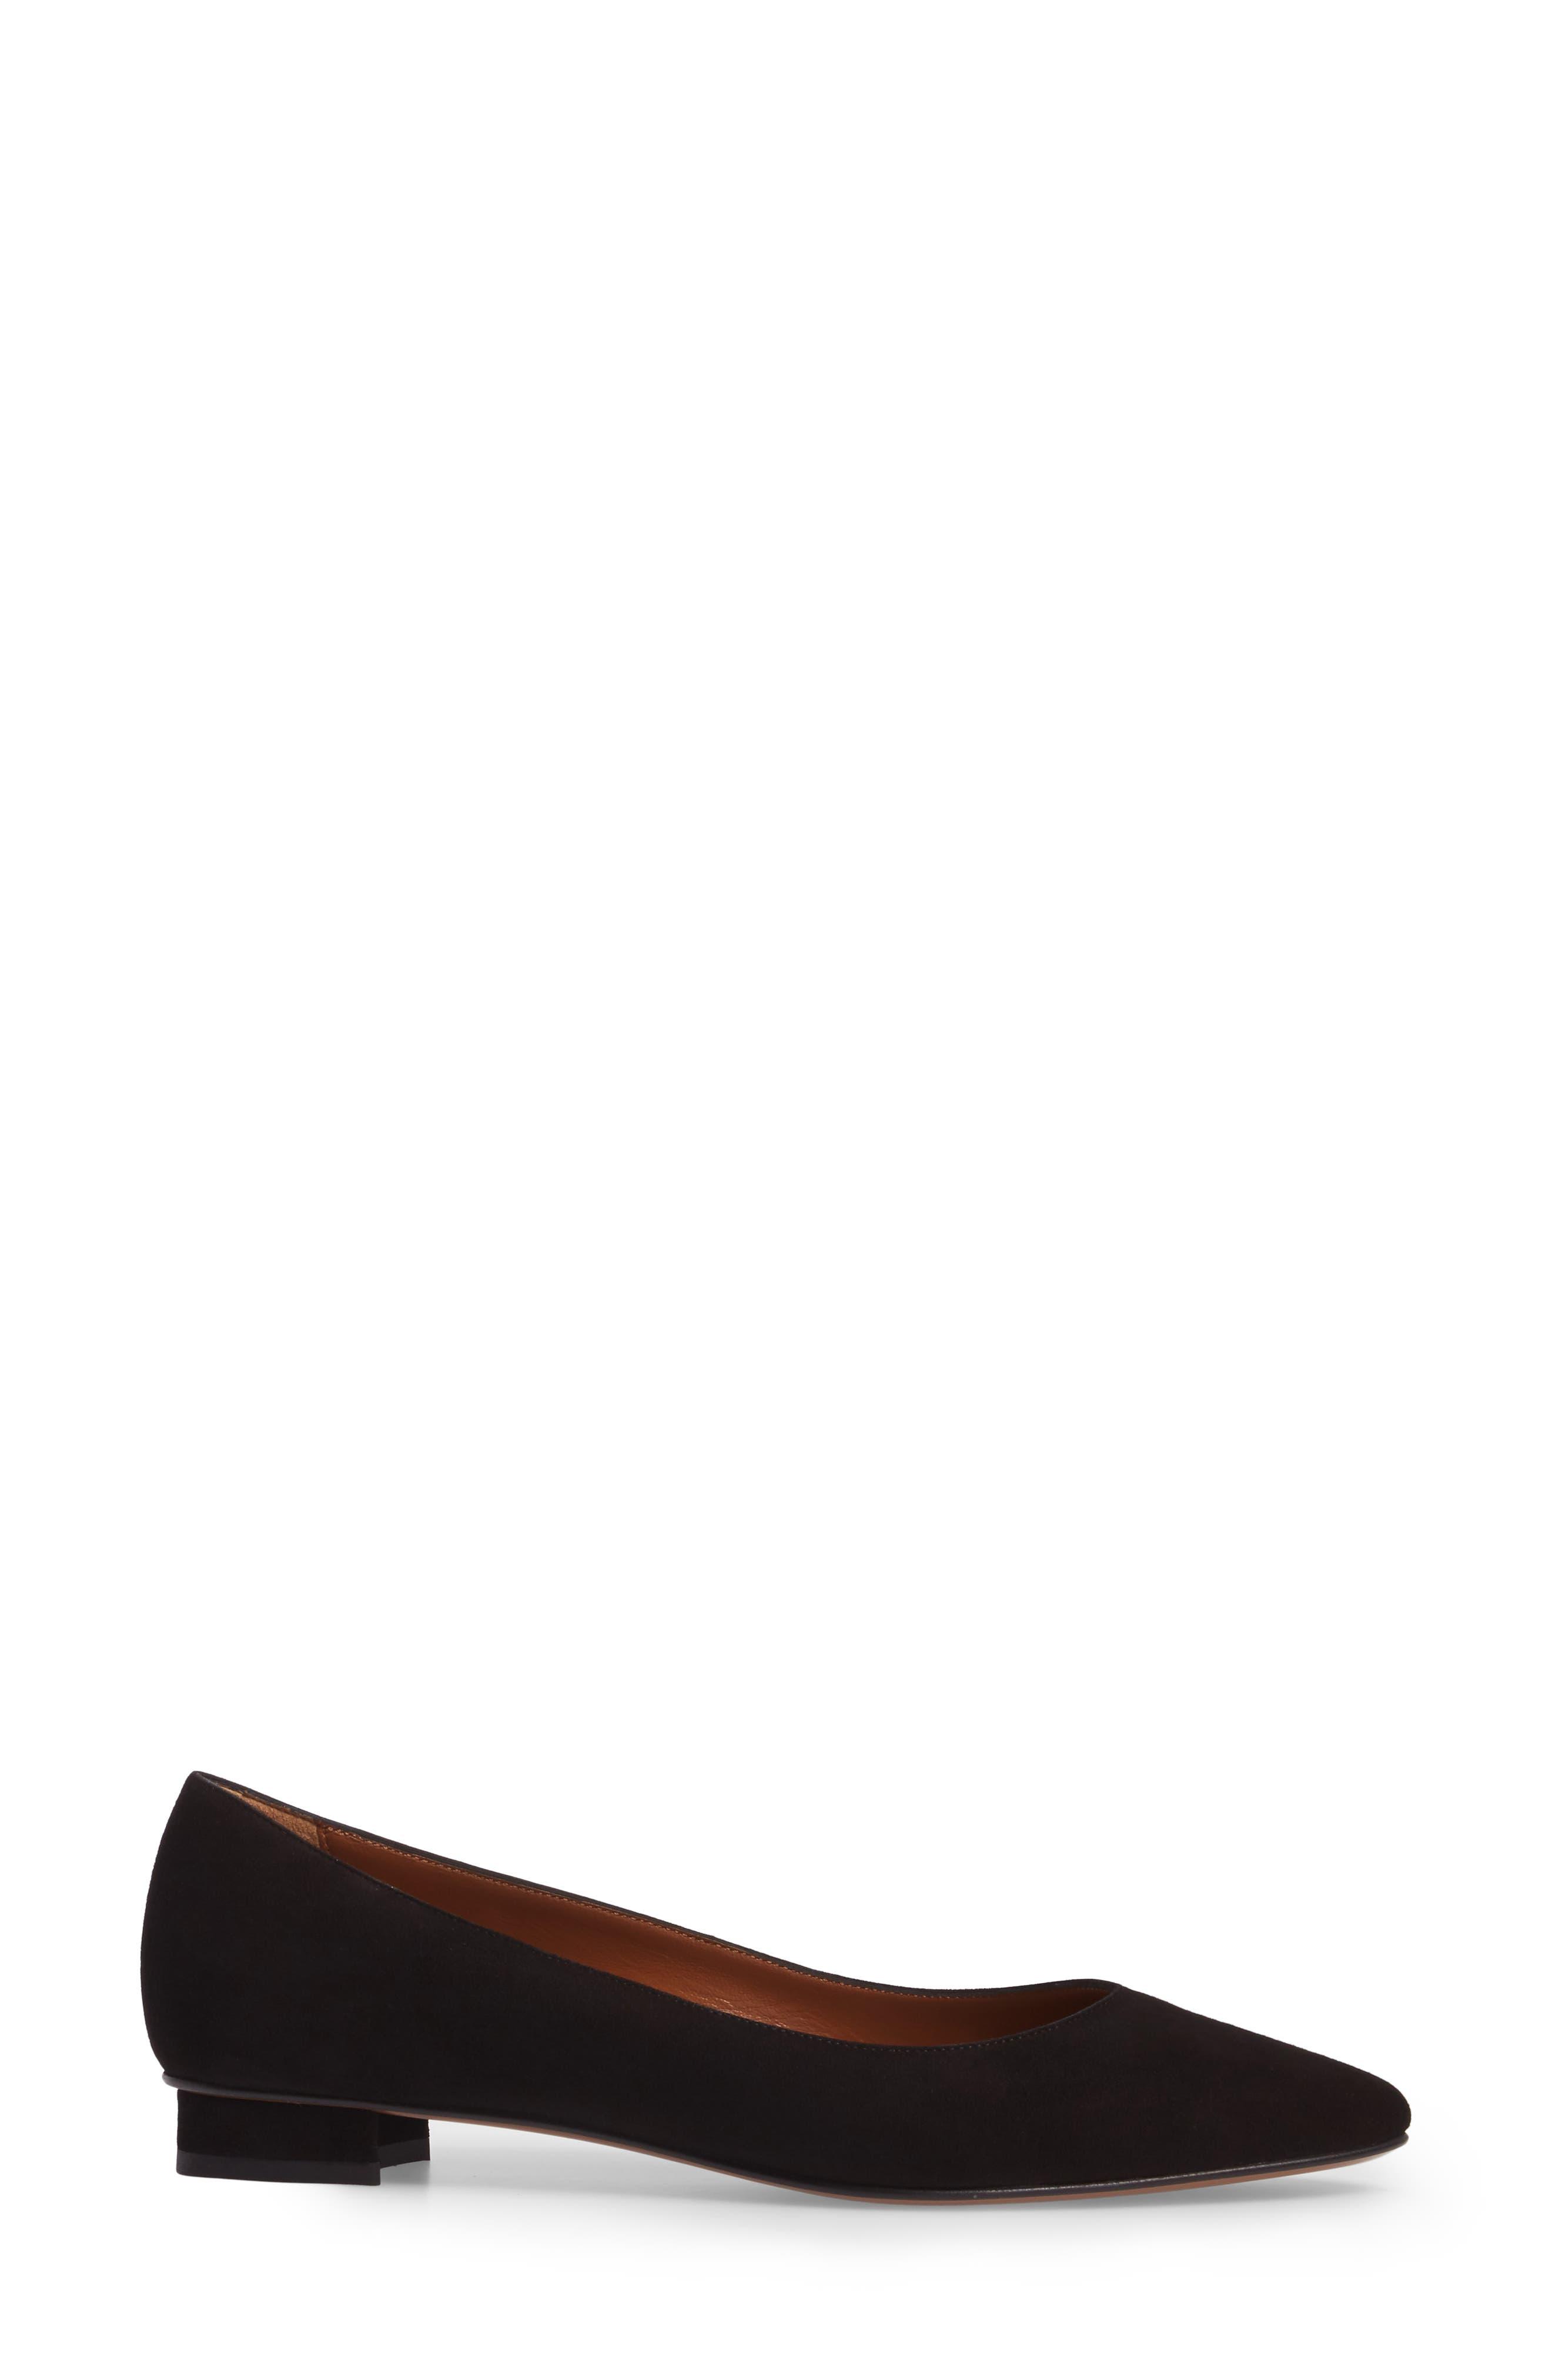 Perla Weatherproof Ballerina Shoe,                             Alternate thumbnail 3, color,                             Black Suede